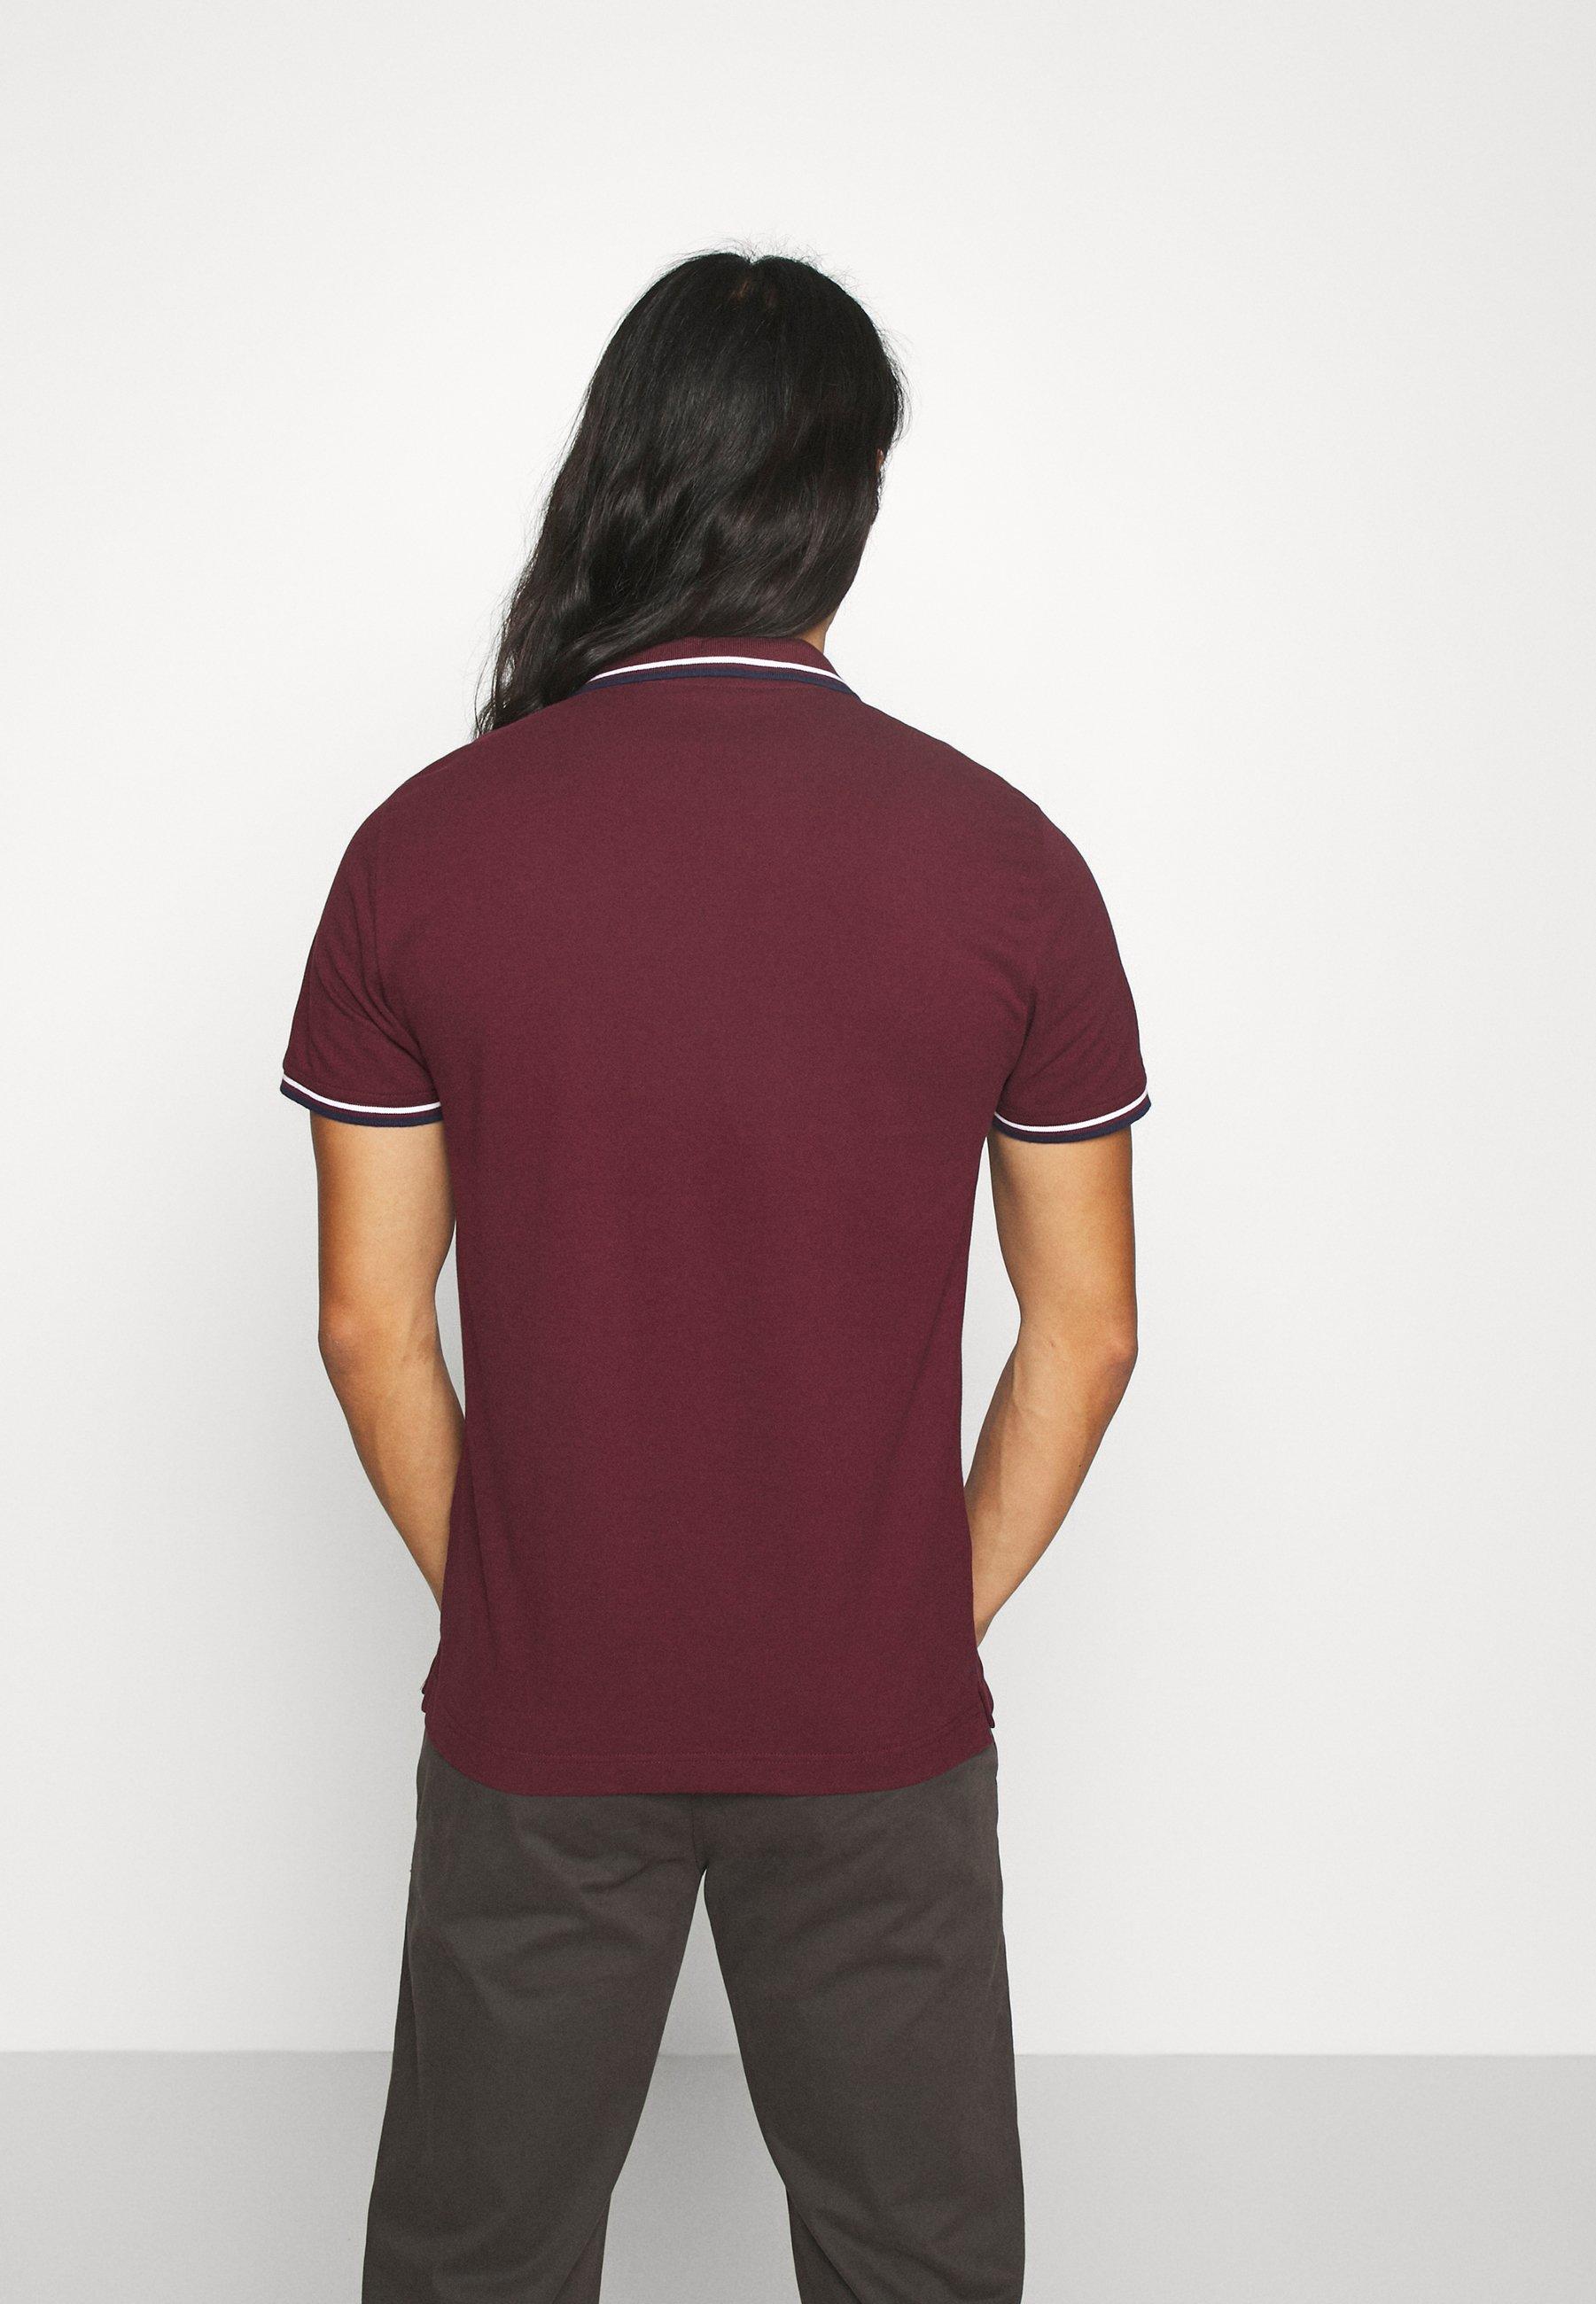 IZOD Polo shirt - port royal g0nxQ